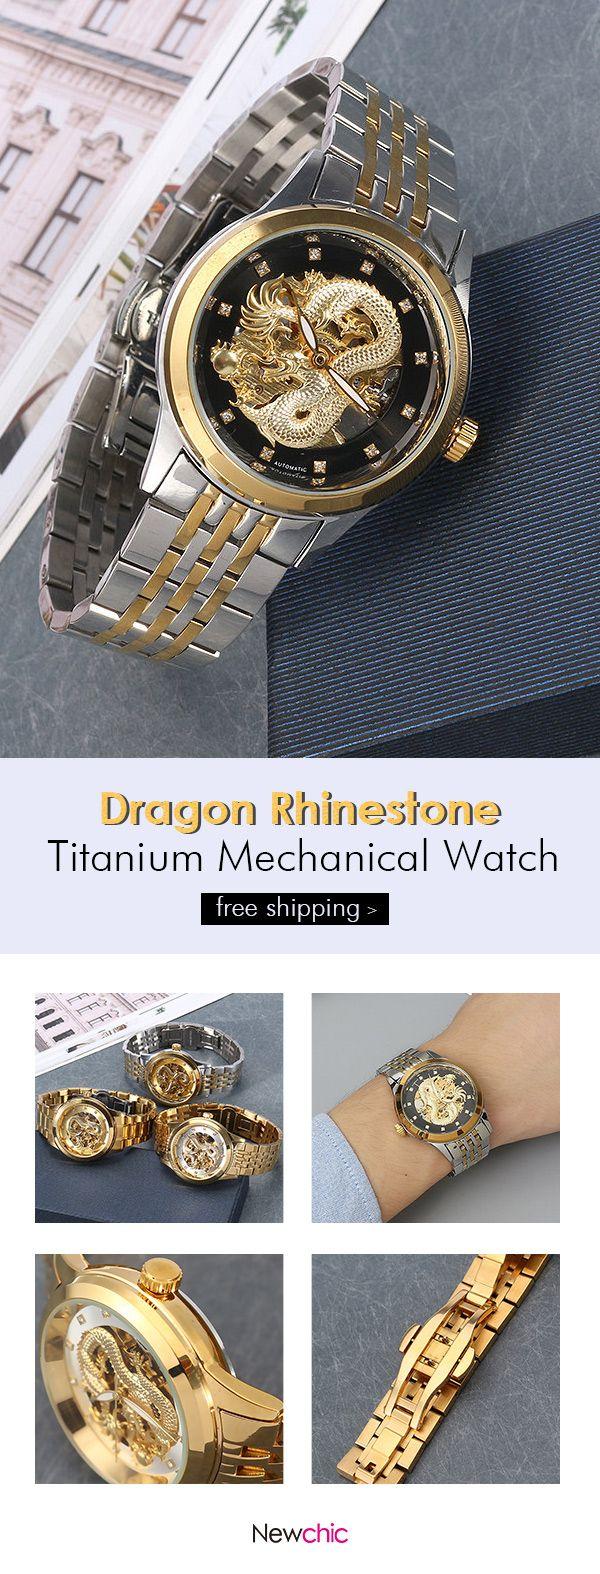 [Newchic Online Shopping] 50% OFF Dragon Rhinestone Titanium Watch